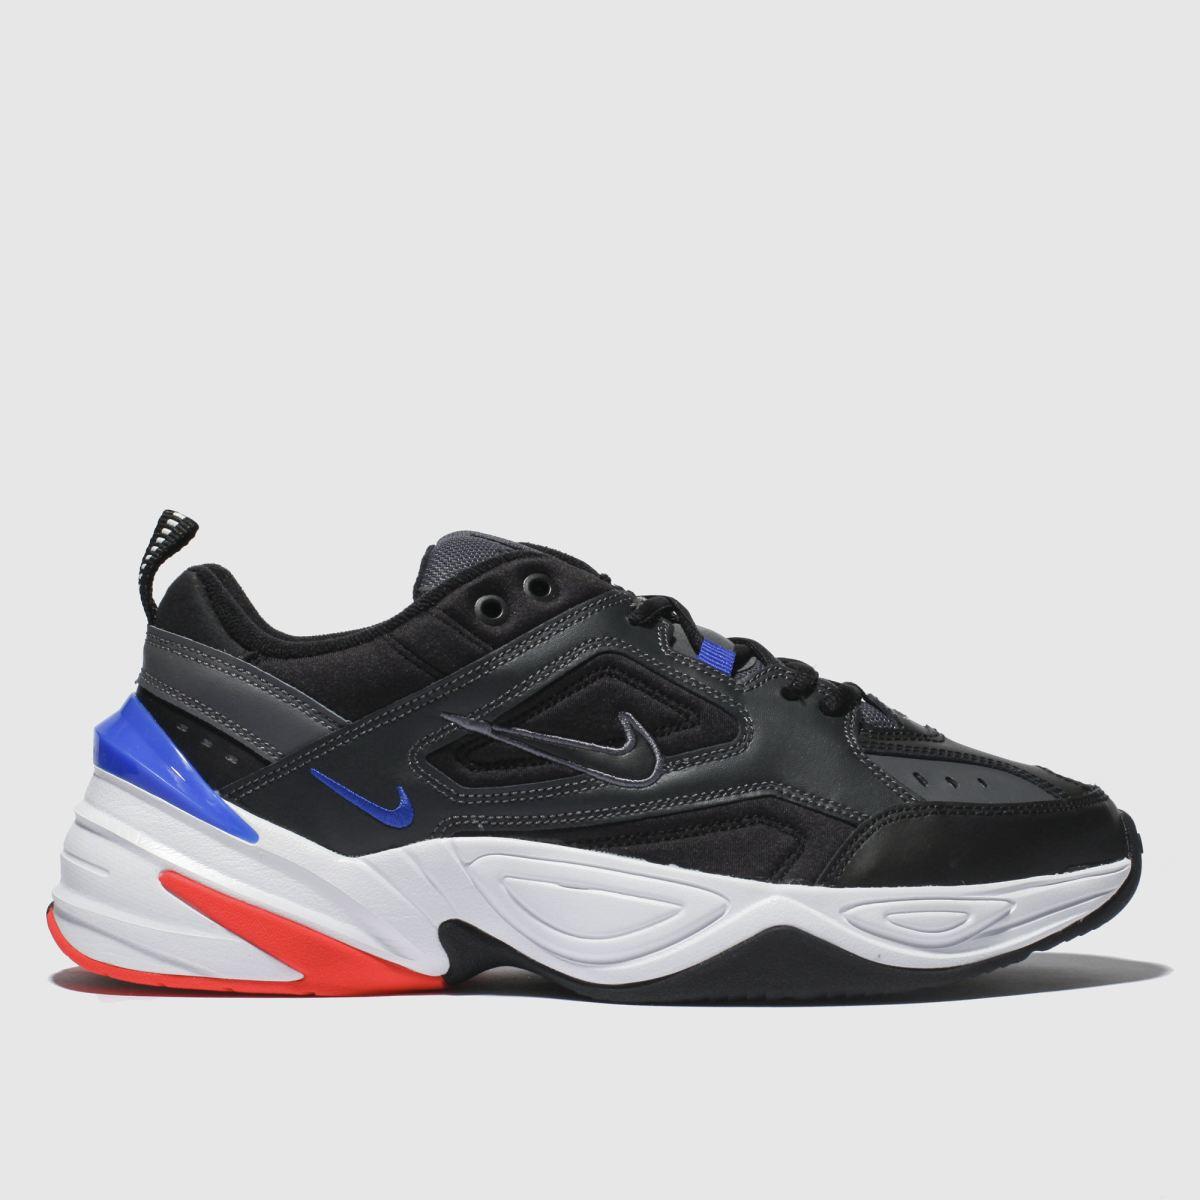 Nike Dark Grey M2k Tekno Trainers